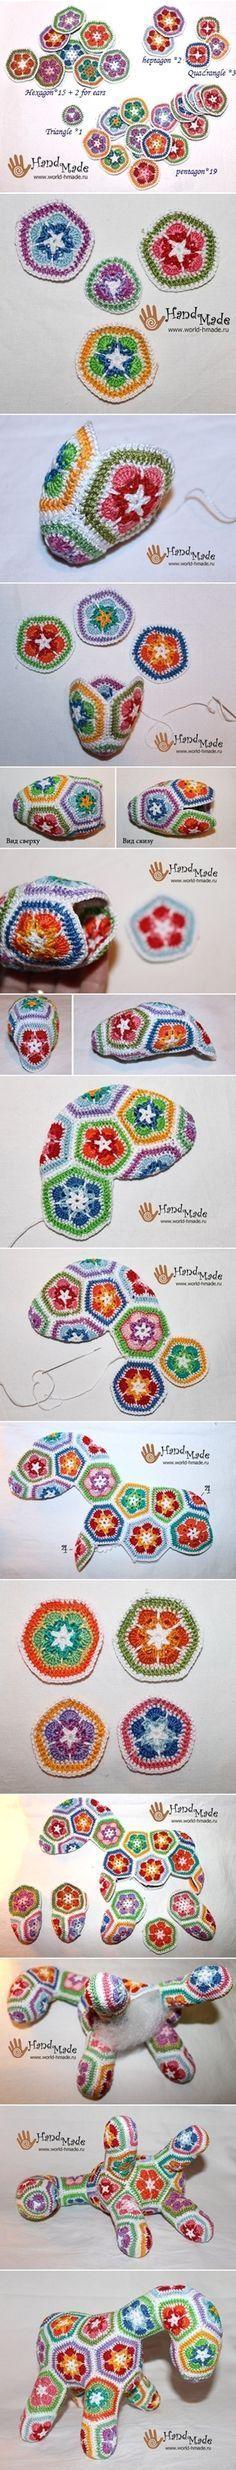 "Crochet ""Afrain Flower"" Horse DIY | www.FabricArtDIY.com"